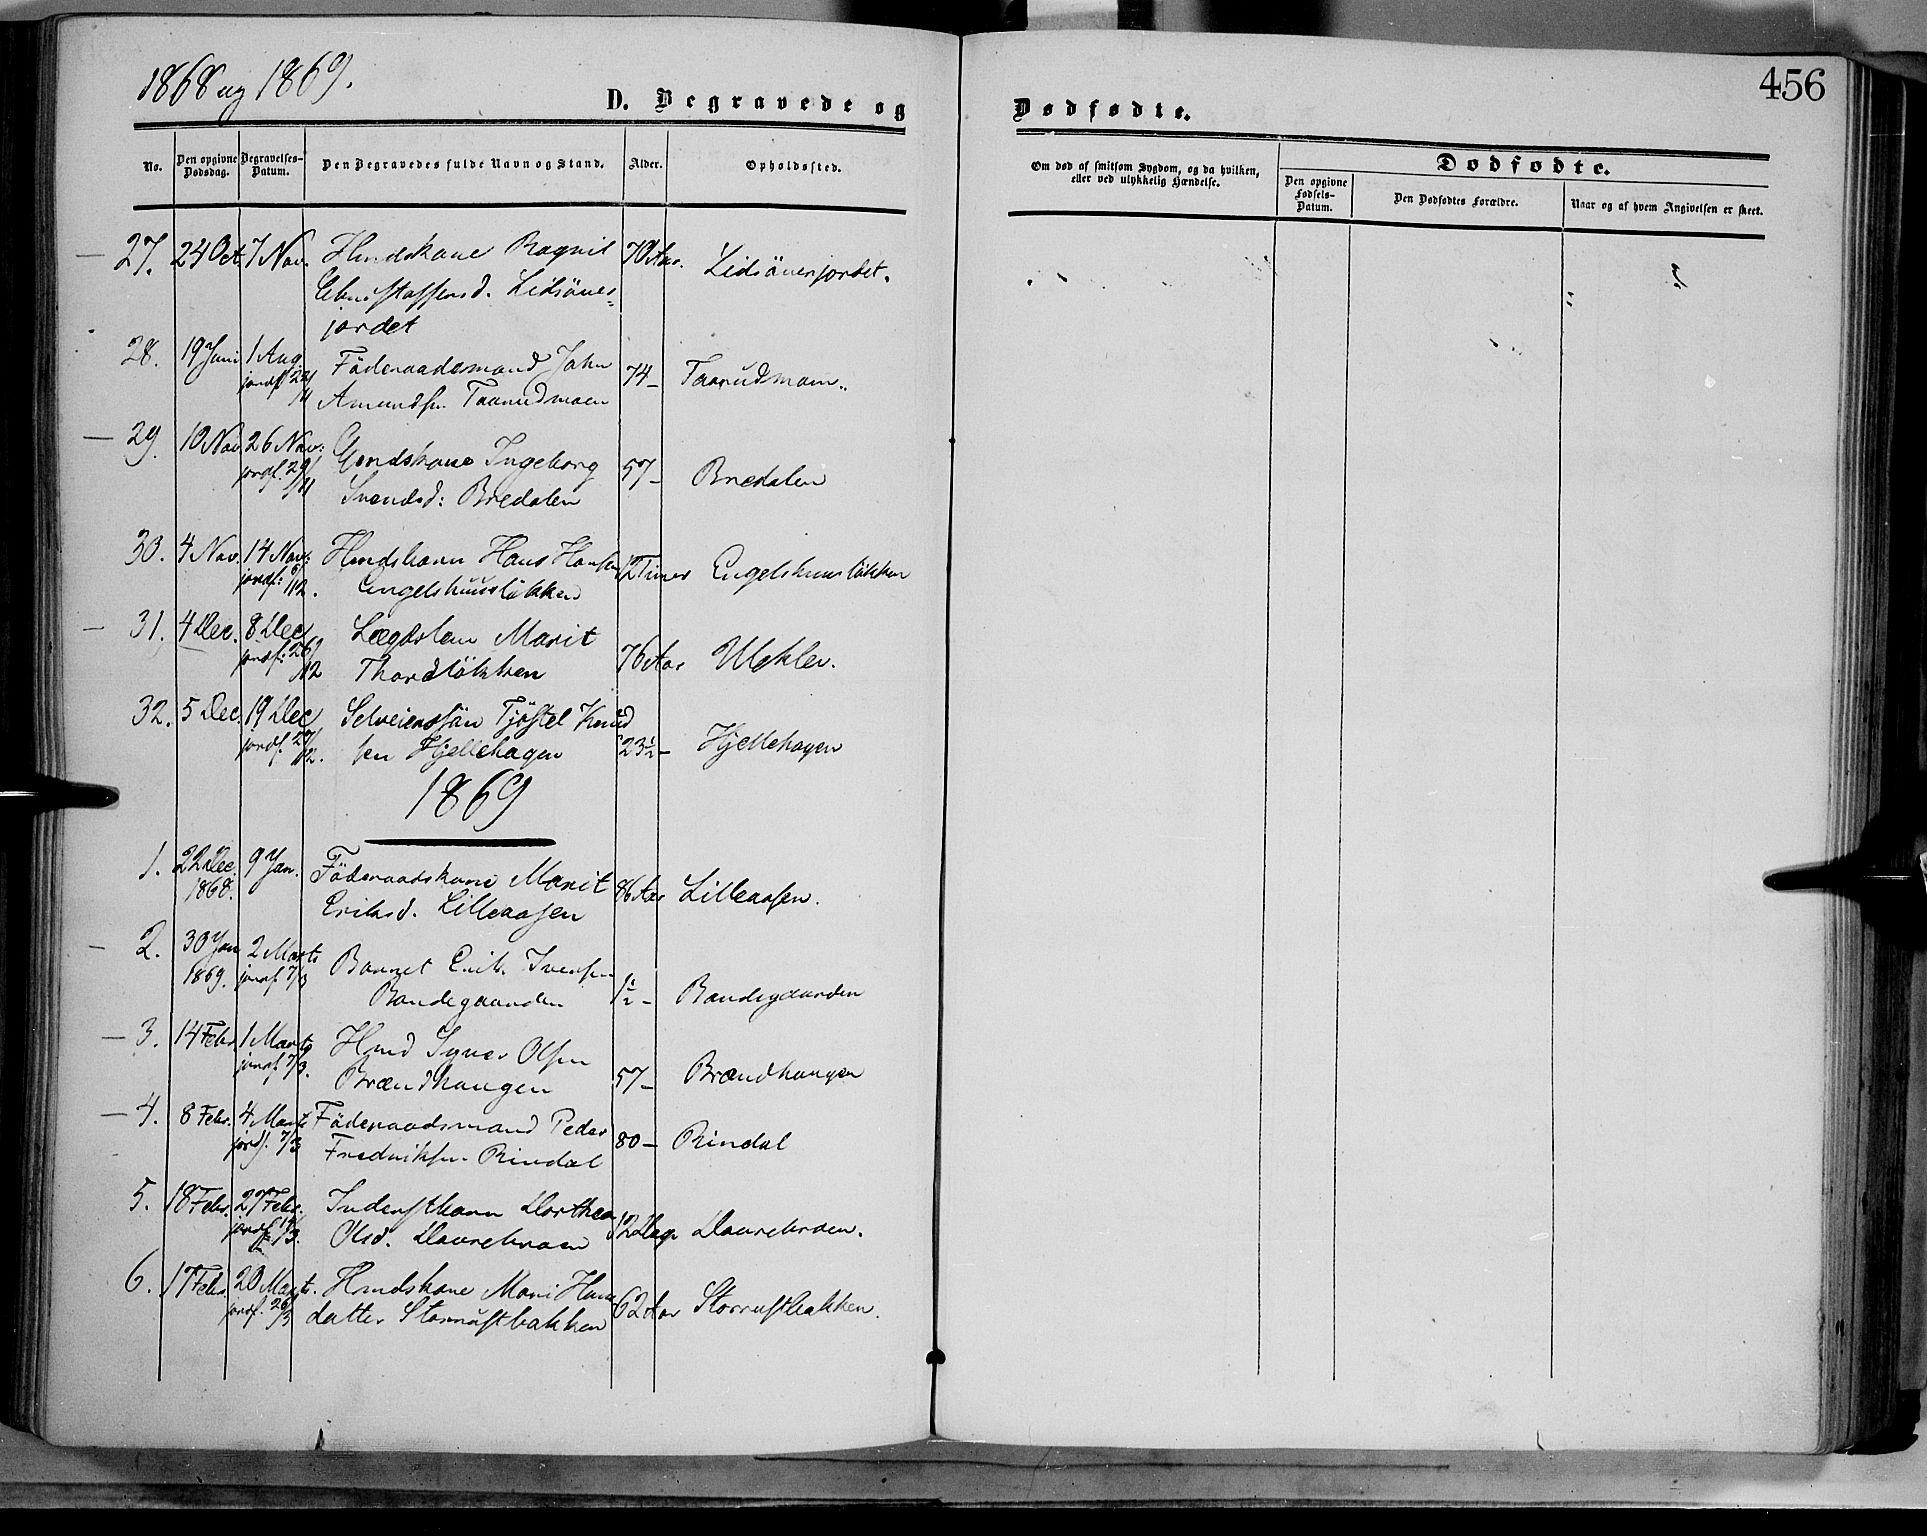 SAH, Dovre prestekontor, Ministerialbok nr. 1, 1854-1878, s. 456